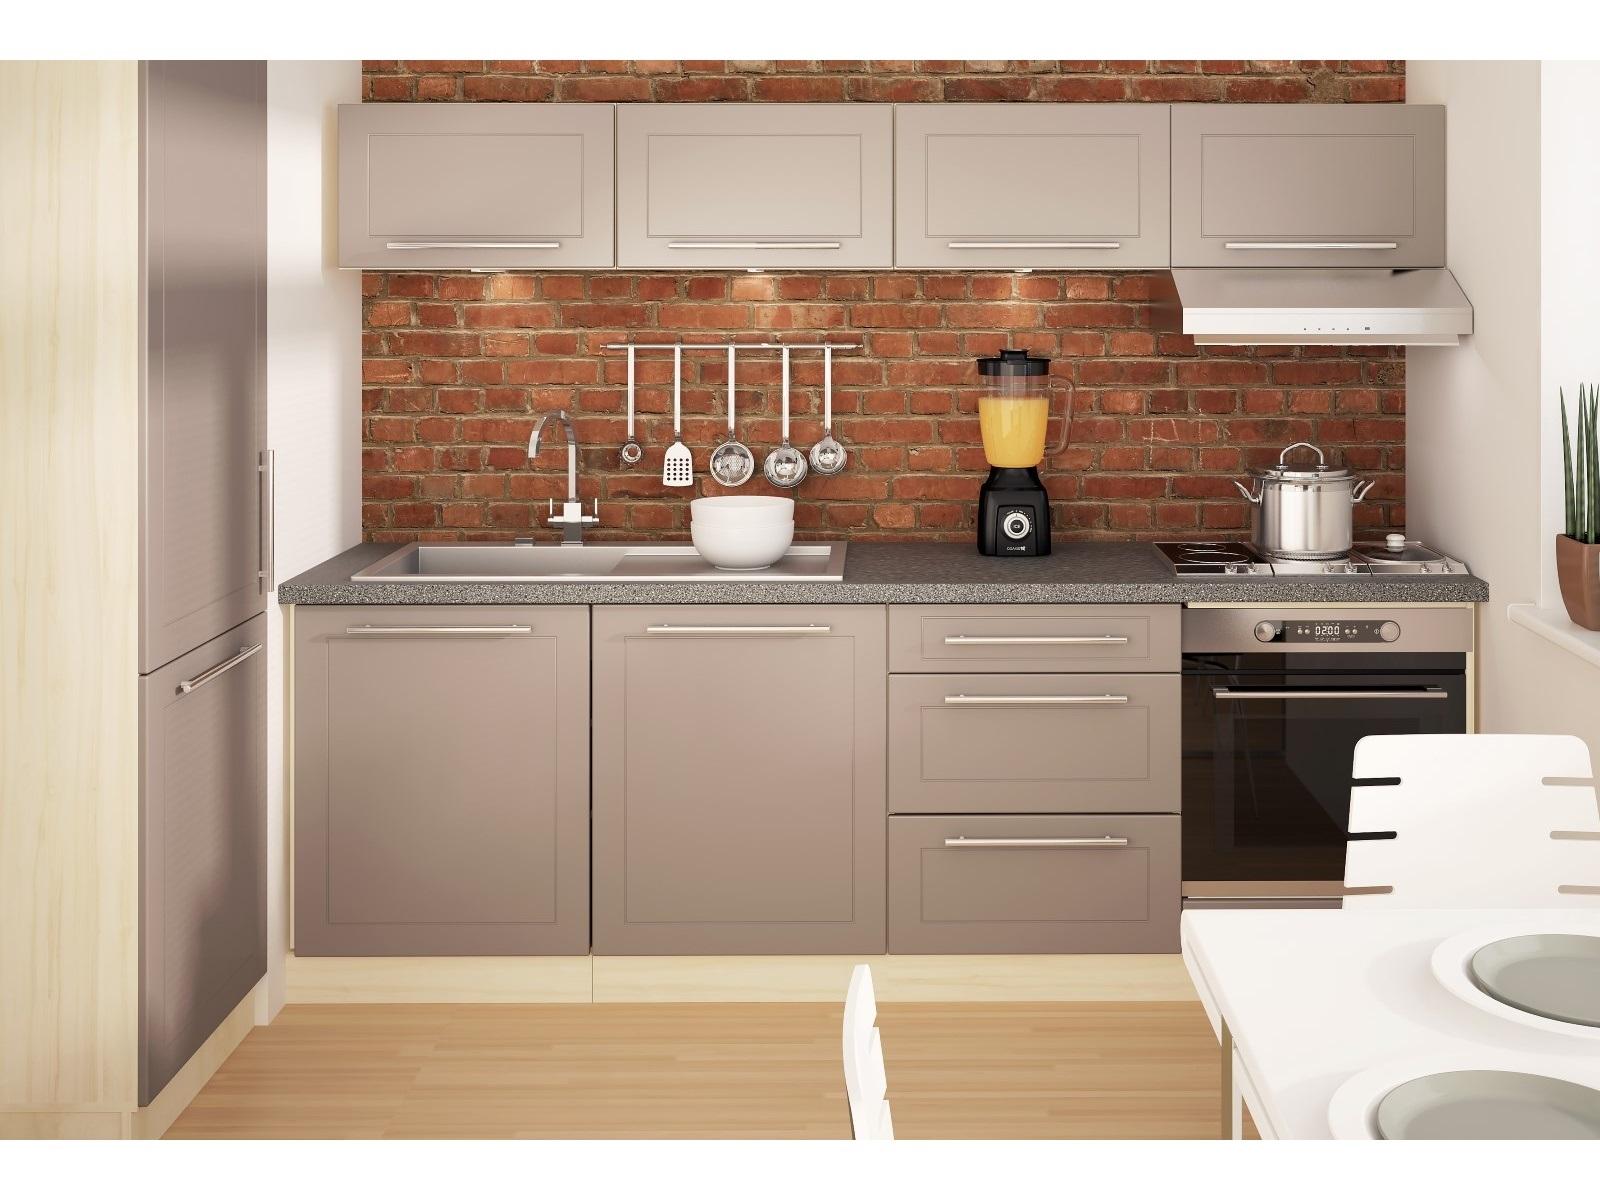 Extom Kuchyně QUANTUM, vzorová sestava, beige mat/jersey